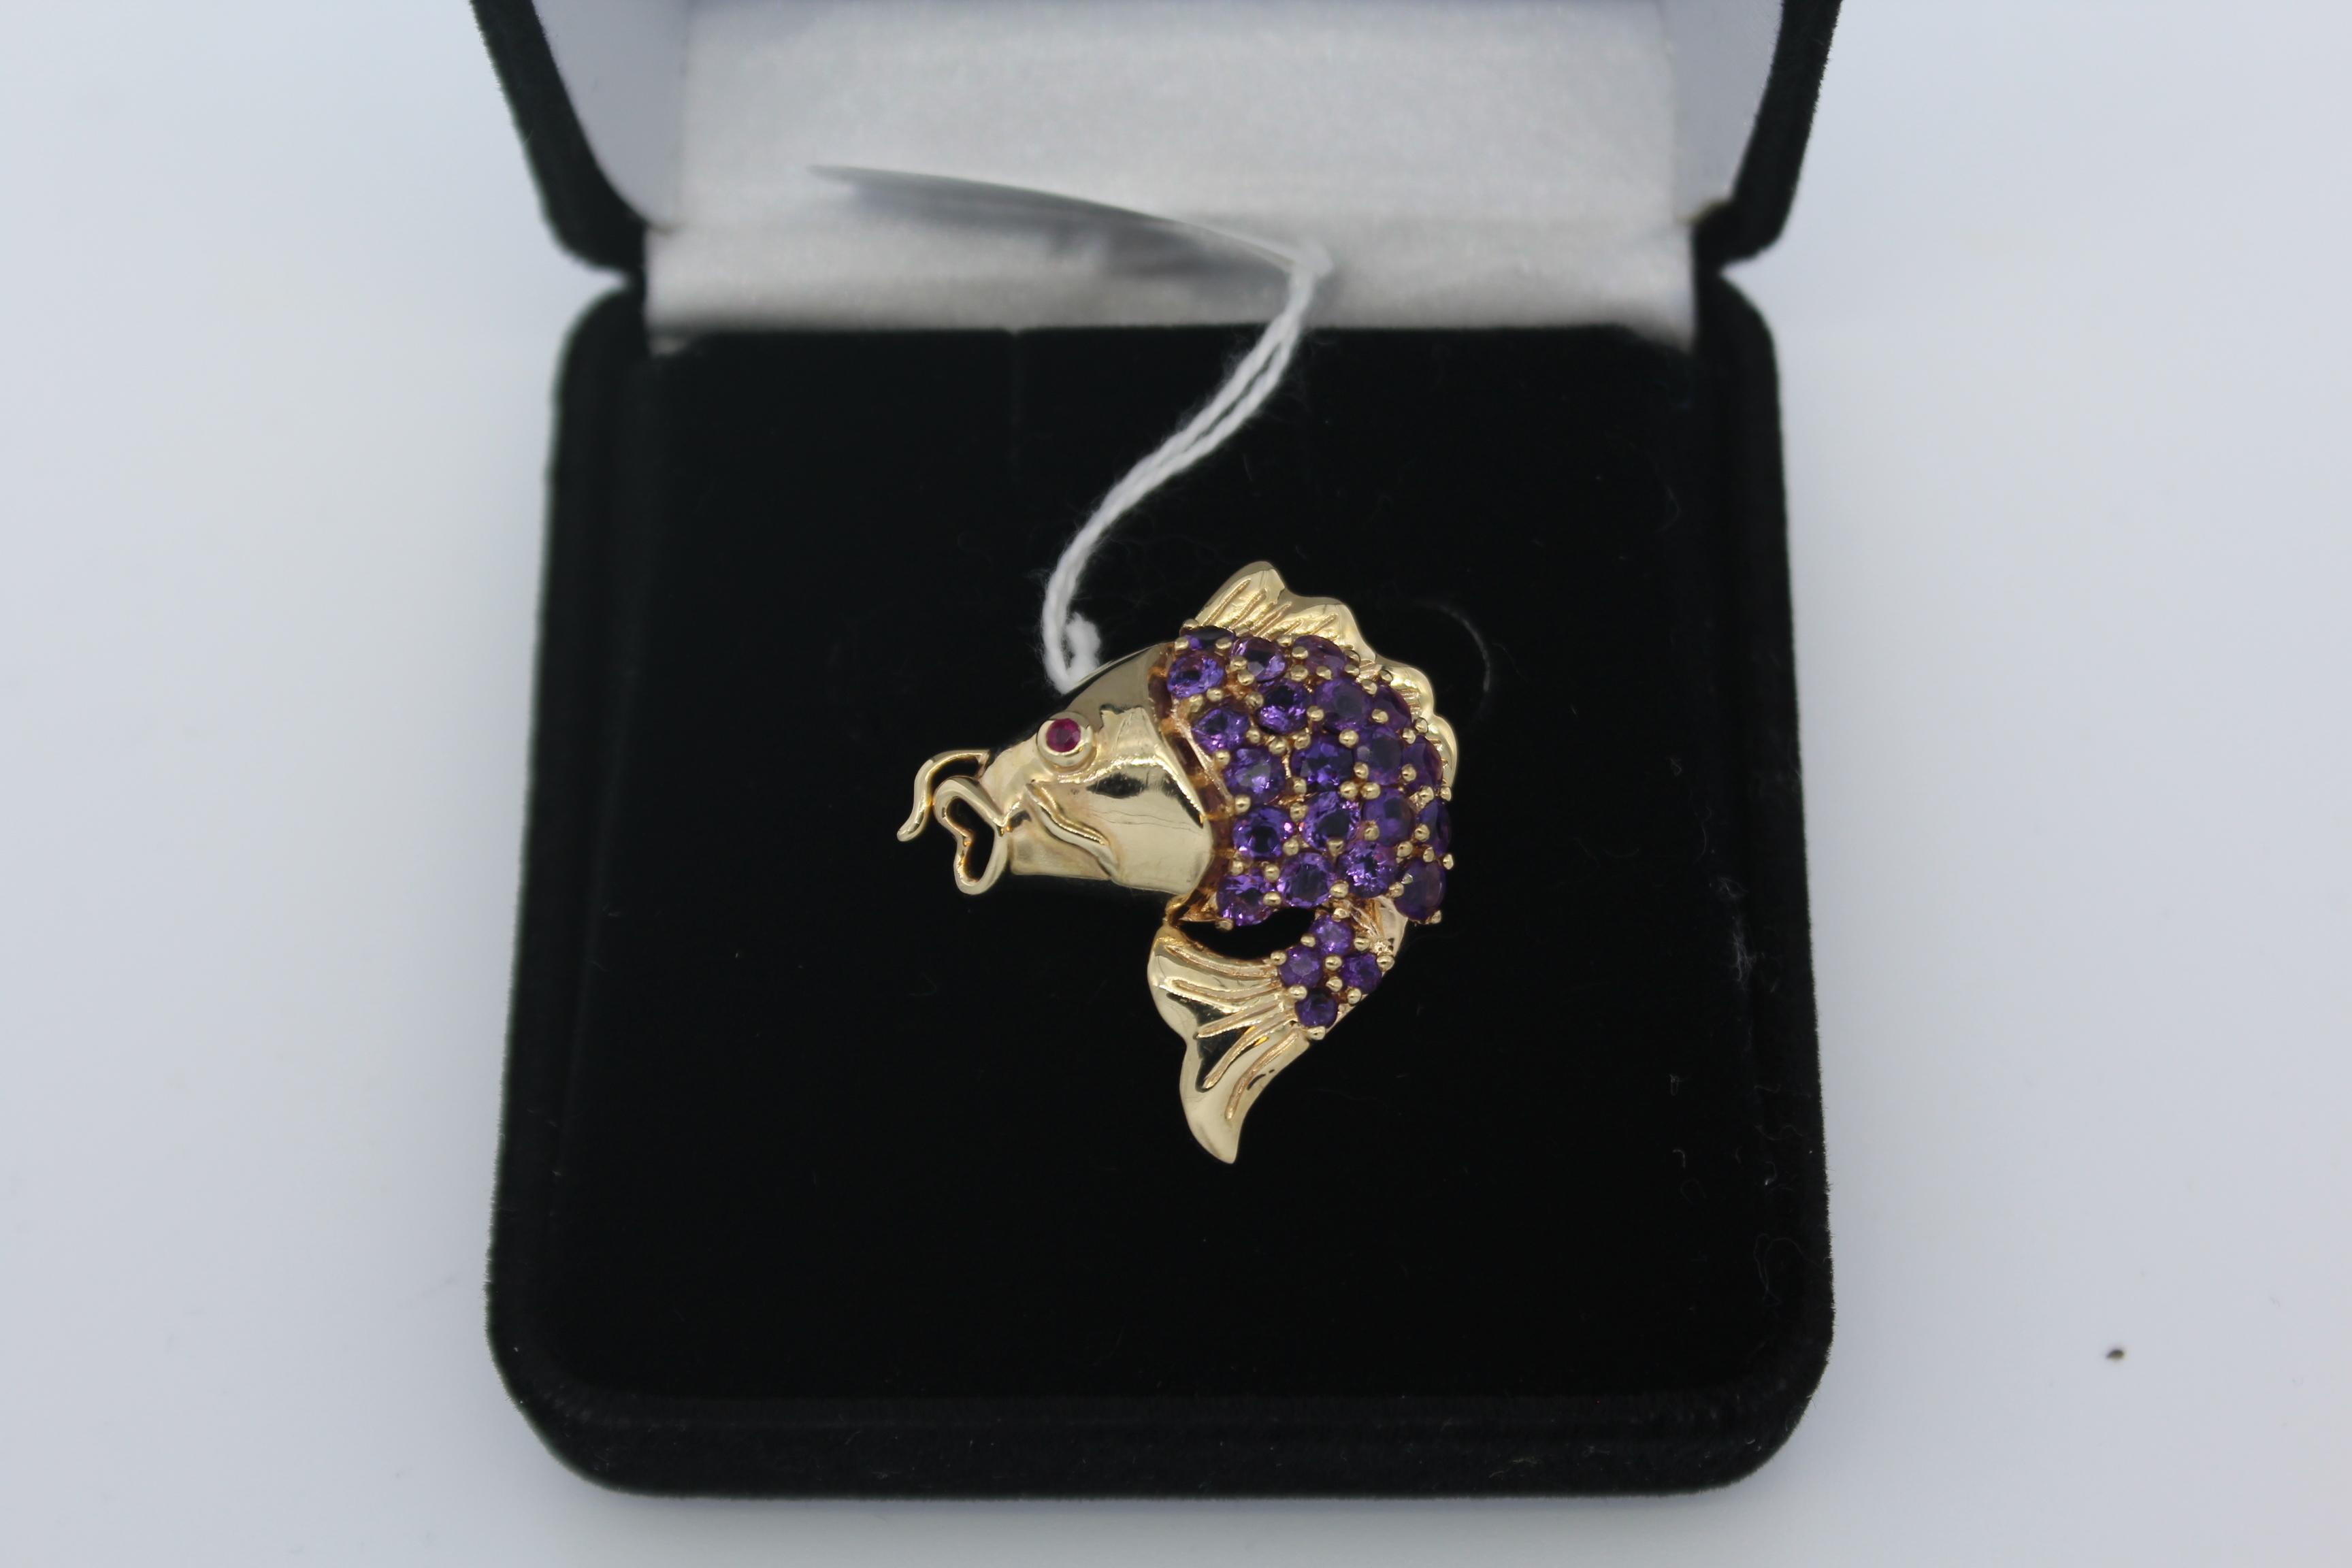 14K Yellow Gold with Purple Stones Fish Pendant